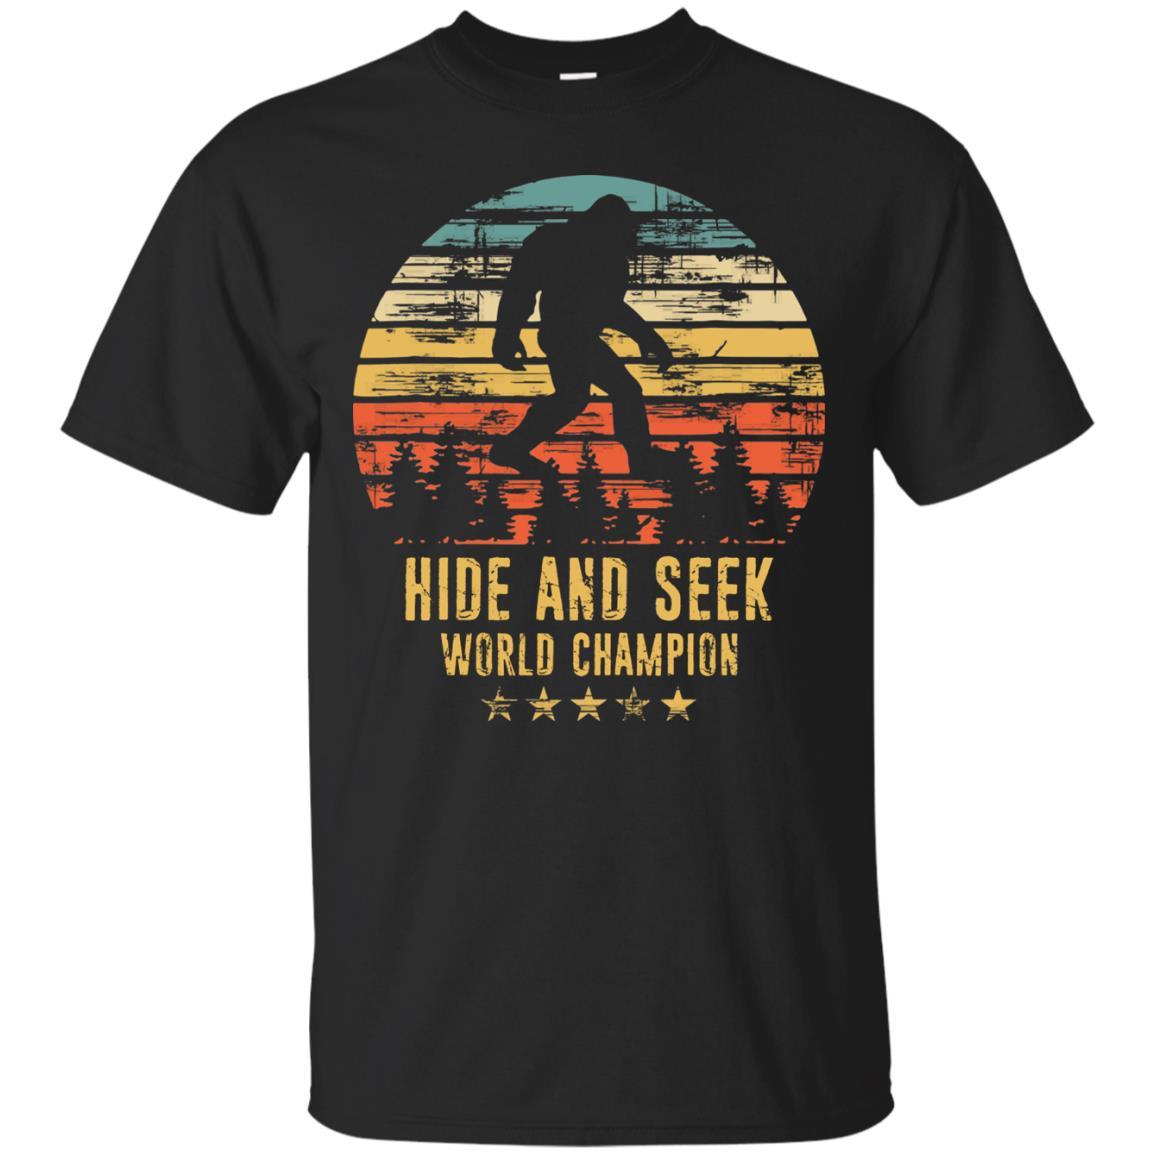 d649a5d80bf1 Hide and seek world champion t shirt, long sleeve, hoodie -  RobinPlaceFabrics